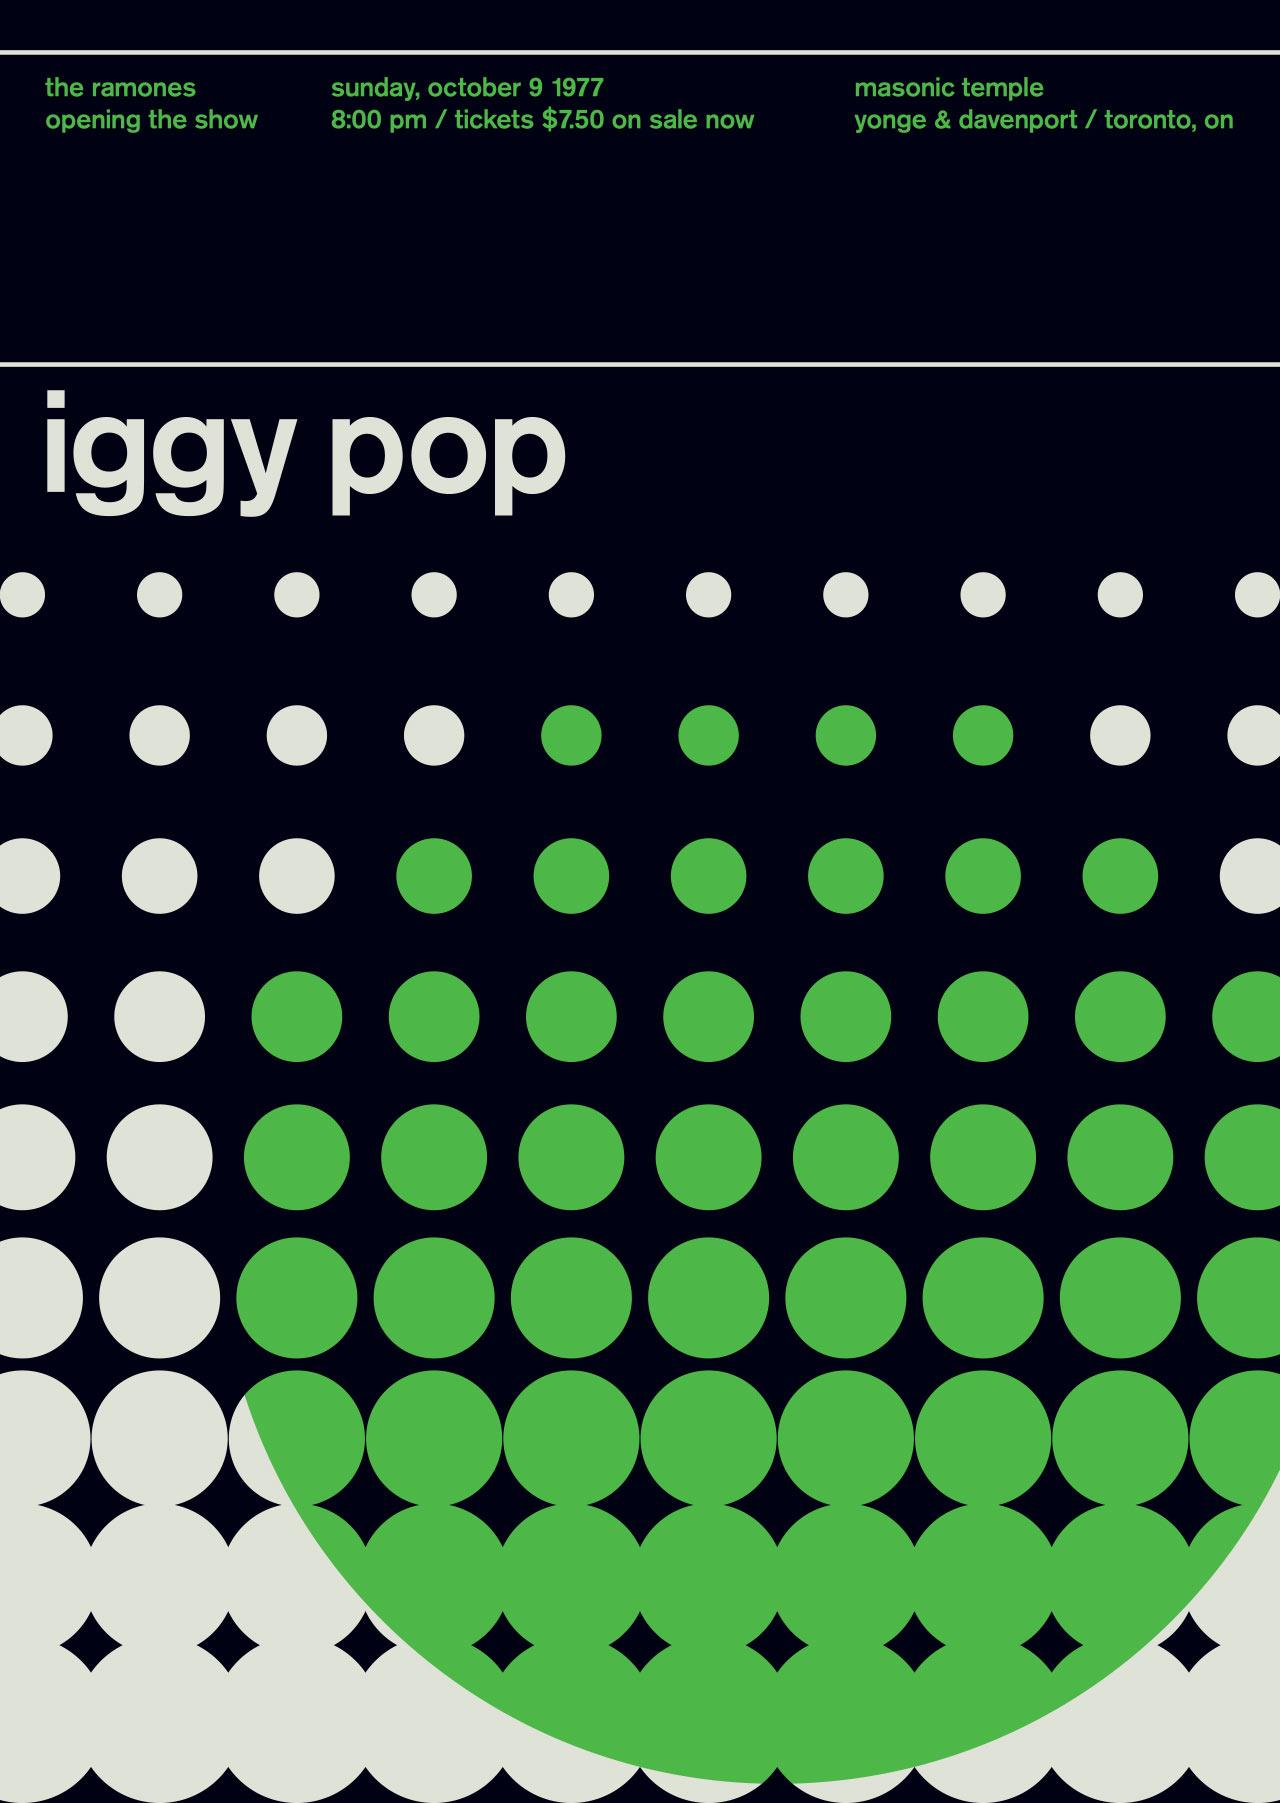 Swissted-Legends_Posters-6-iggy_pop_legends_series